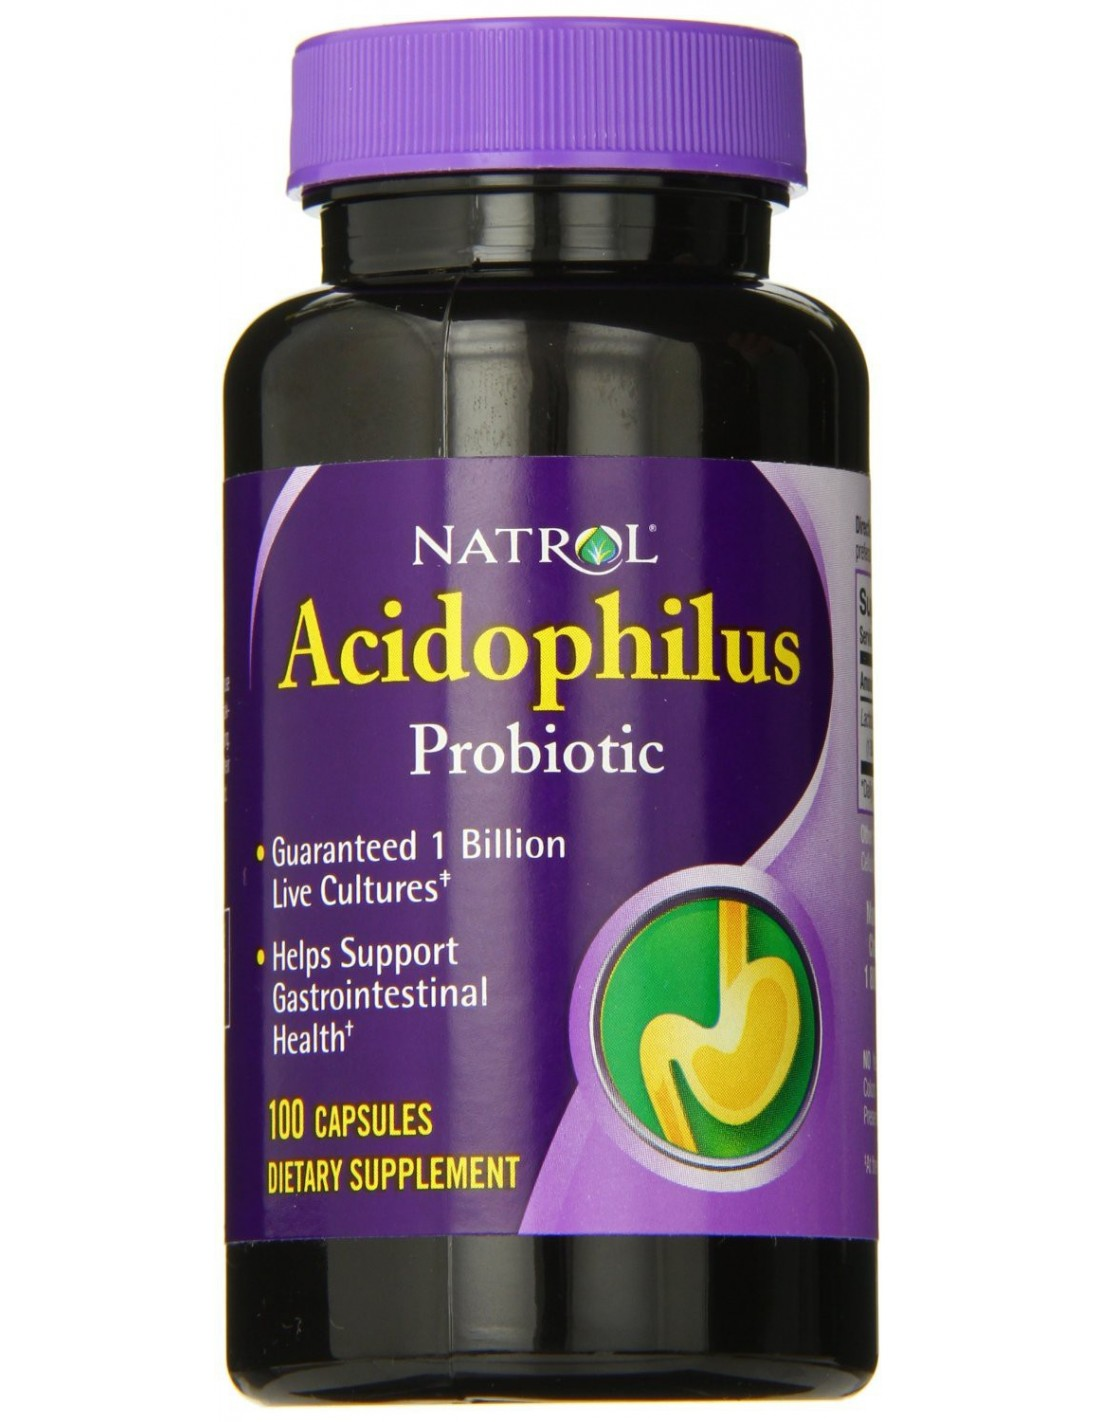 Natrol ACIDOPHILUS 100 mg 100 caps